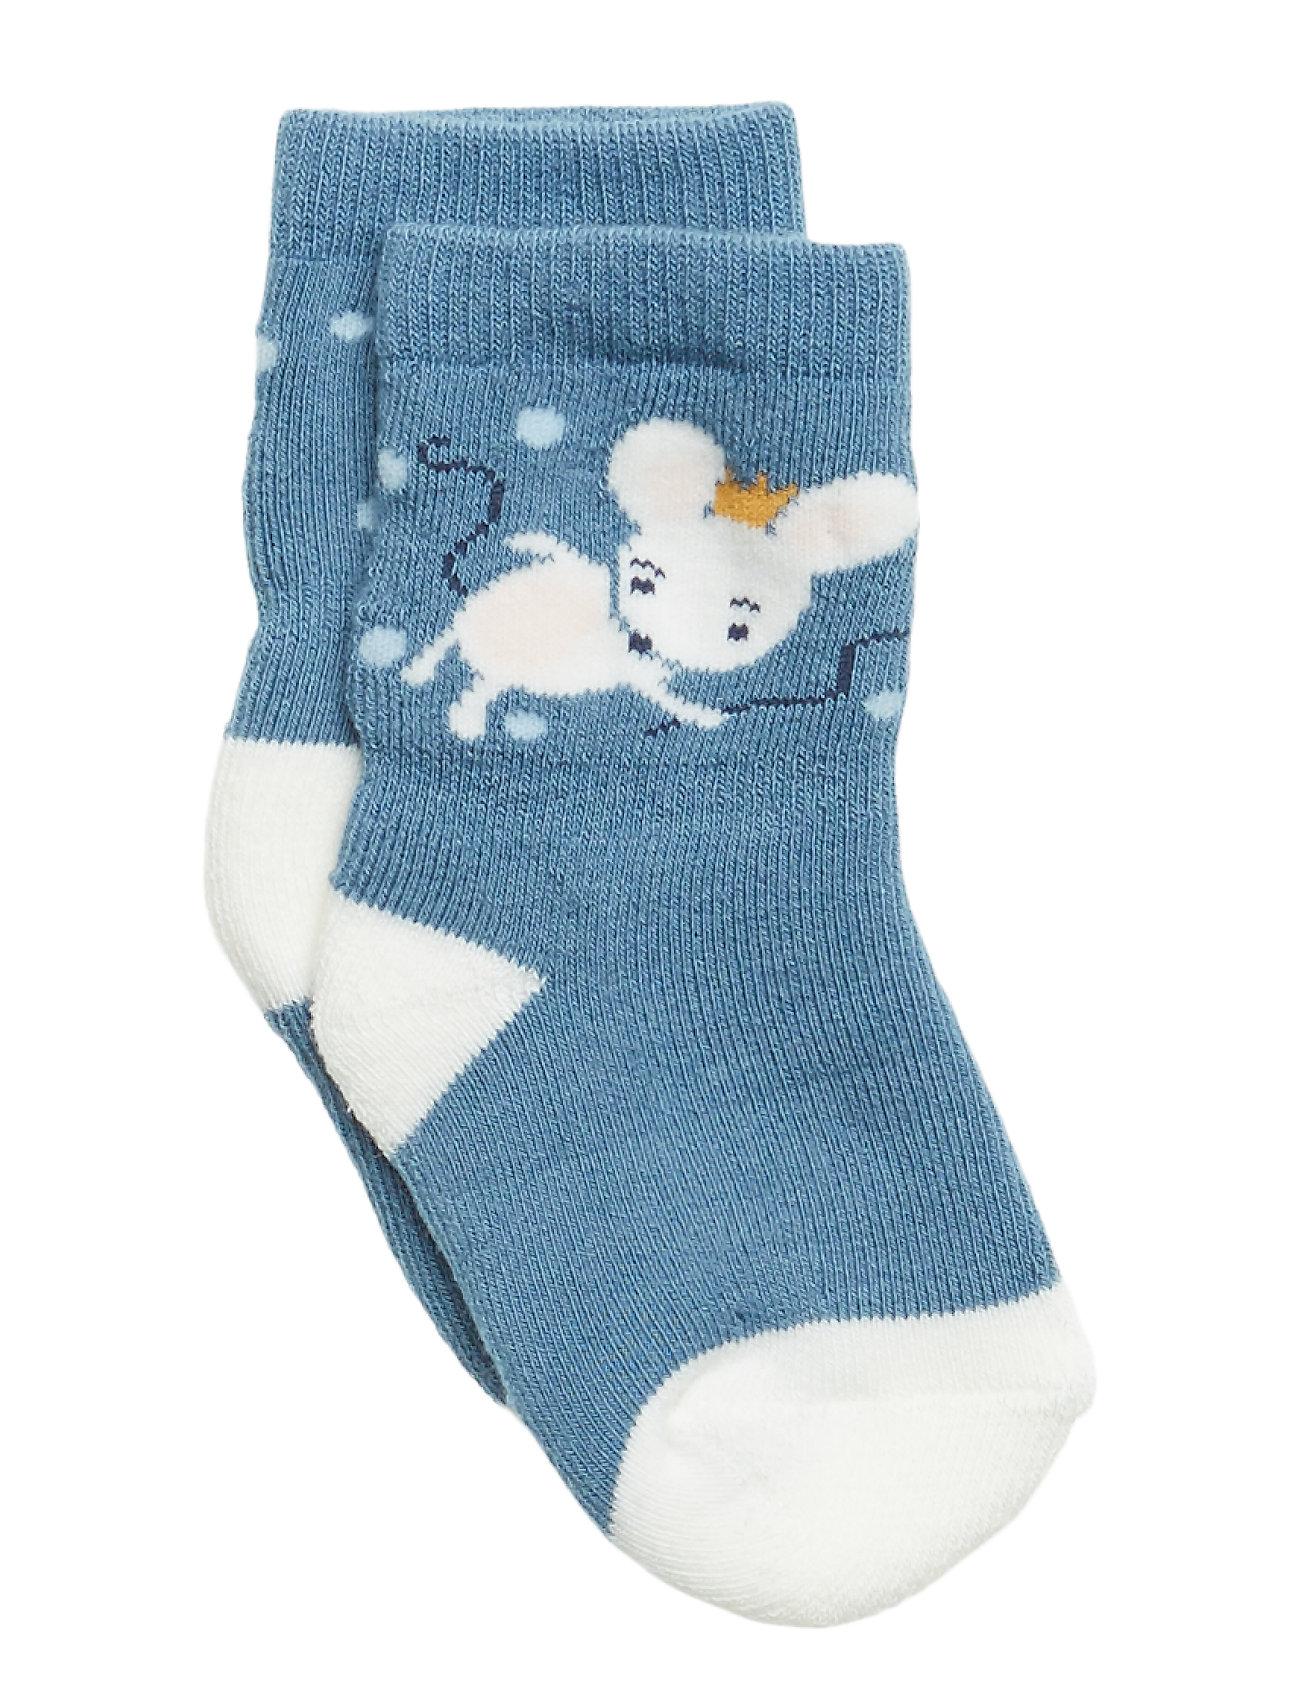 Polarn O. Pyret Socks Printed Newborn